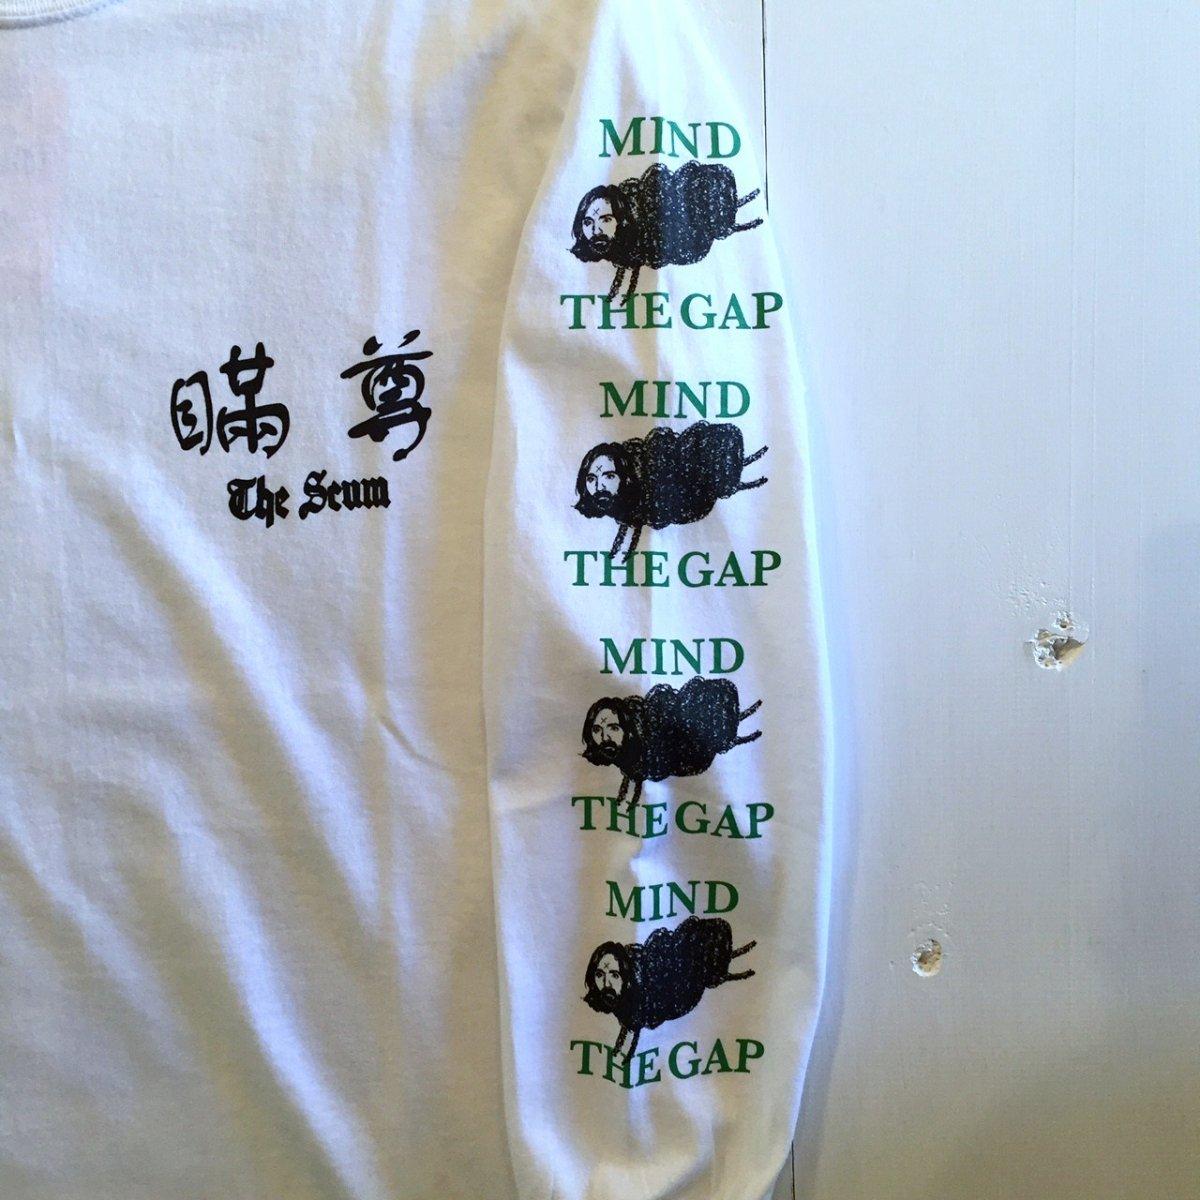 <img class='new_mark_img1' src='https://img.shop-pro.jp/img/new/icons3.gif' style='border:none;display:inline;margin:0px;padding:0px;width:auto;' />Black Weirdos  ブラック ウィドー / ロングTシャツ M-Scum L/S Tee 【WHITE】